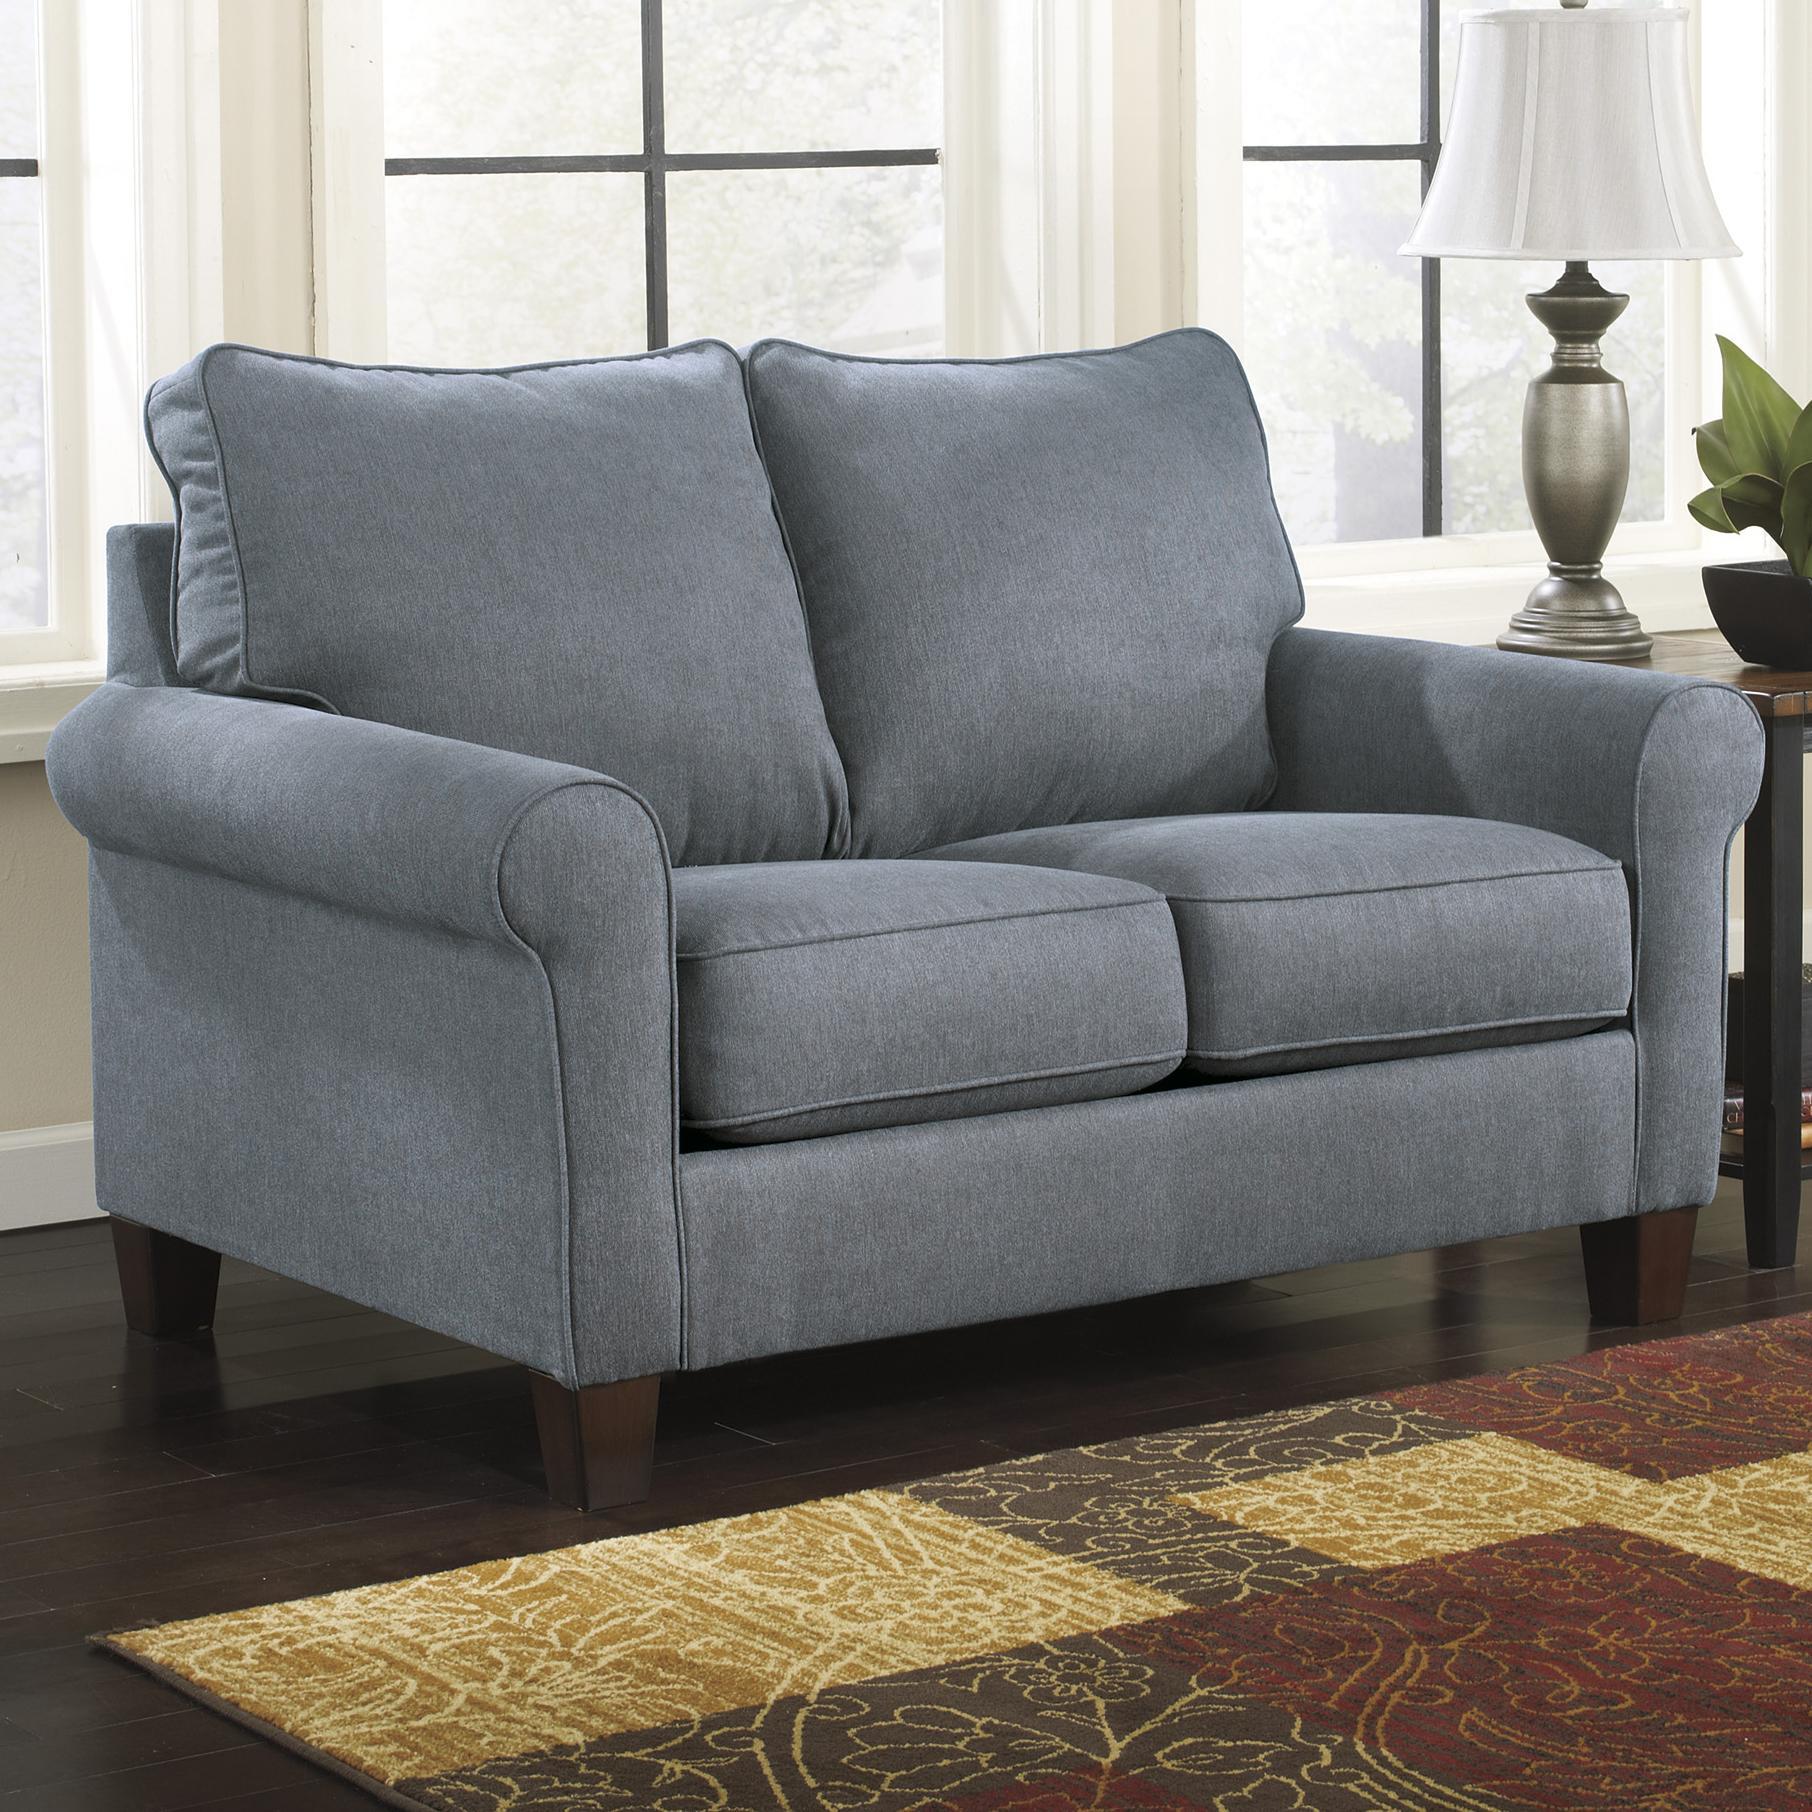 Signature Design by Ashley Zeth - Denim Twin Sofa Sleeper - Item Number: 2710137